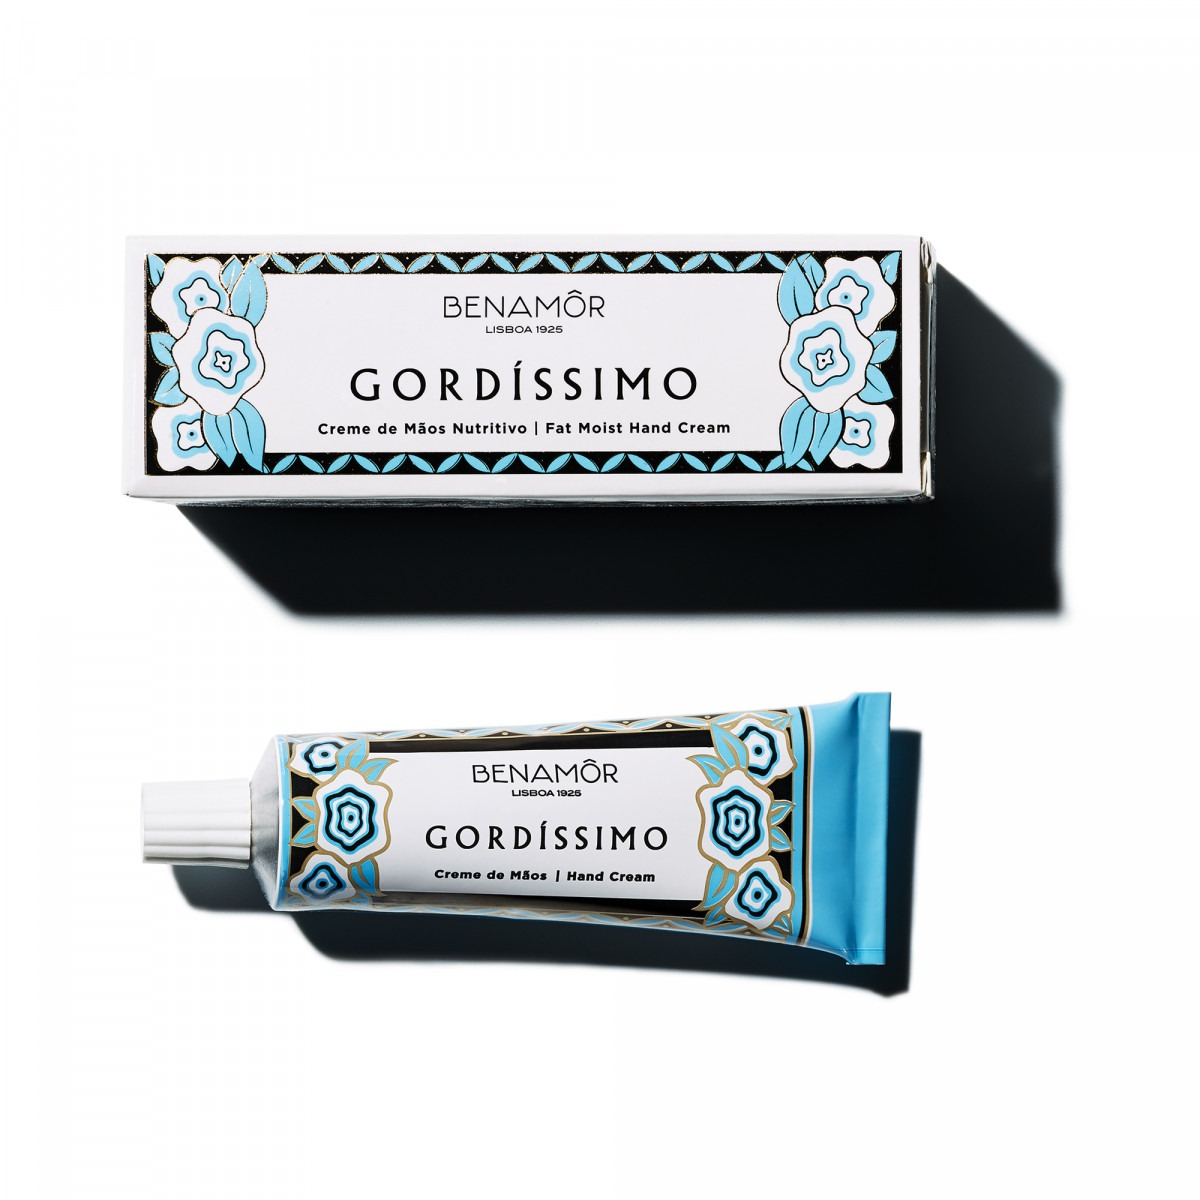 Gordissimo Moist Hand Cream